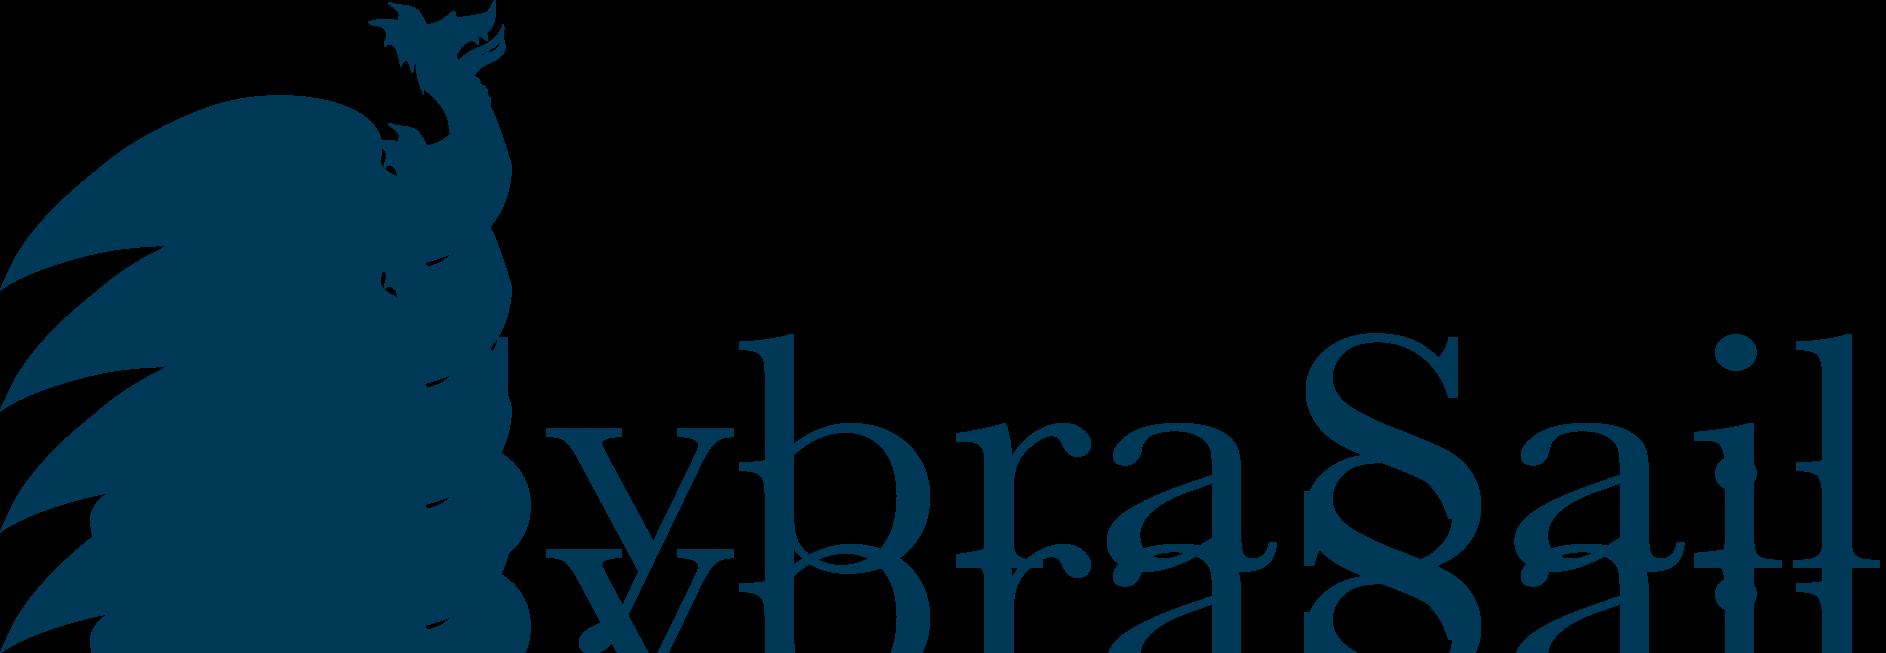 Sybrasail